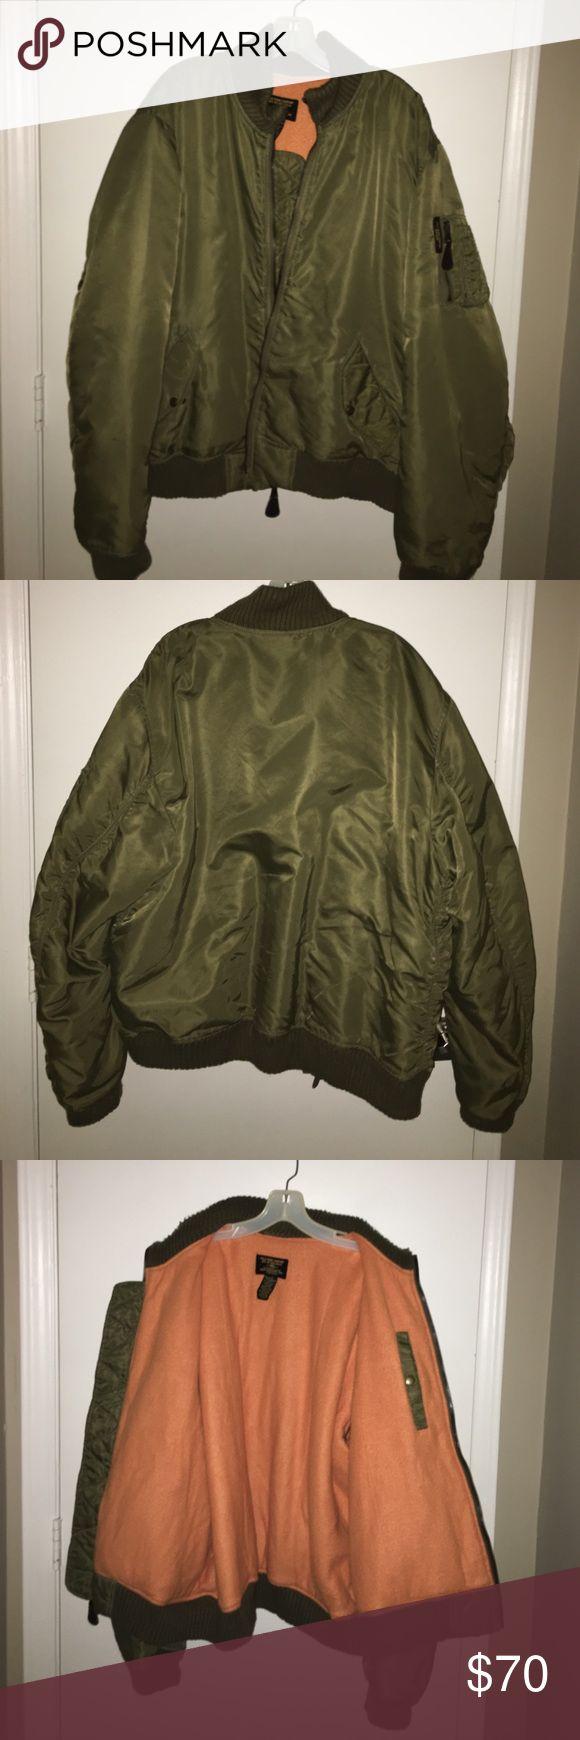 Green bomber jacket army surplus